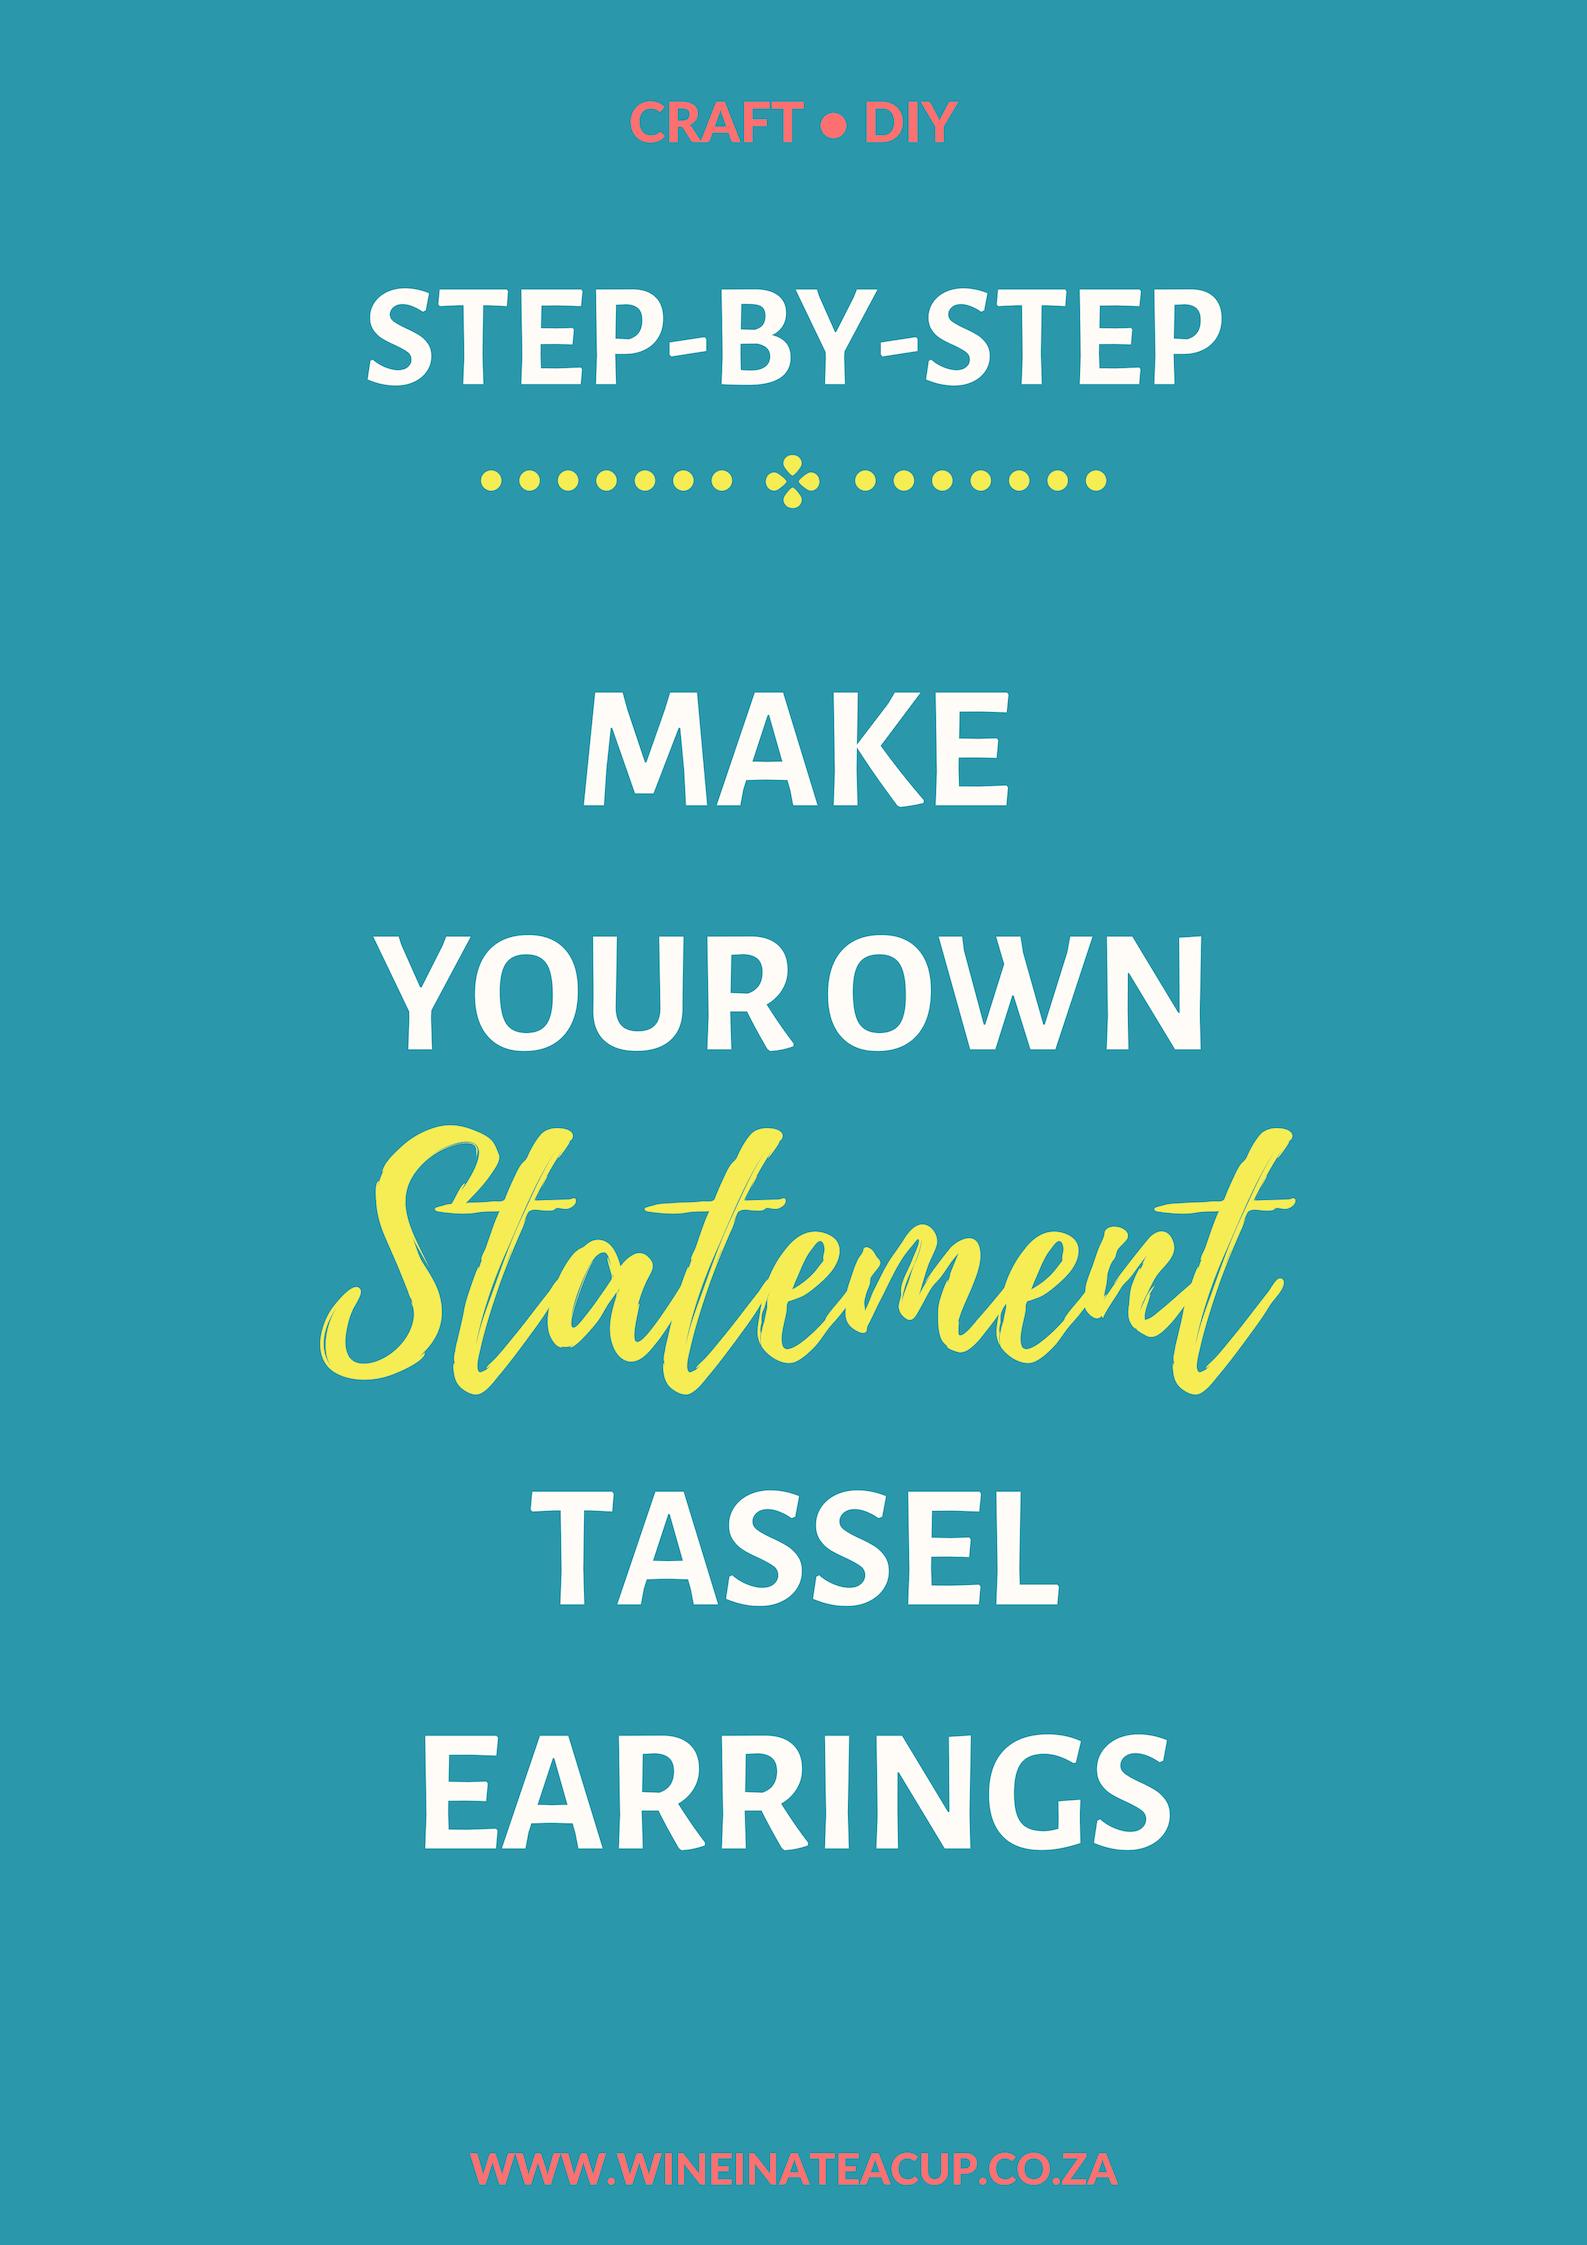 Step by Step instructions to make your own statement tassel earrings! #diy #statementearrings #diyjewelry